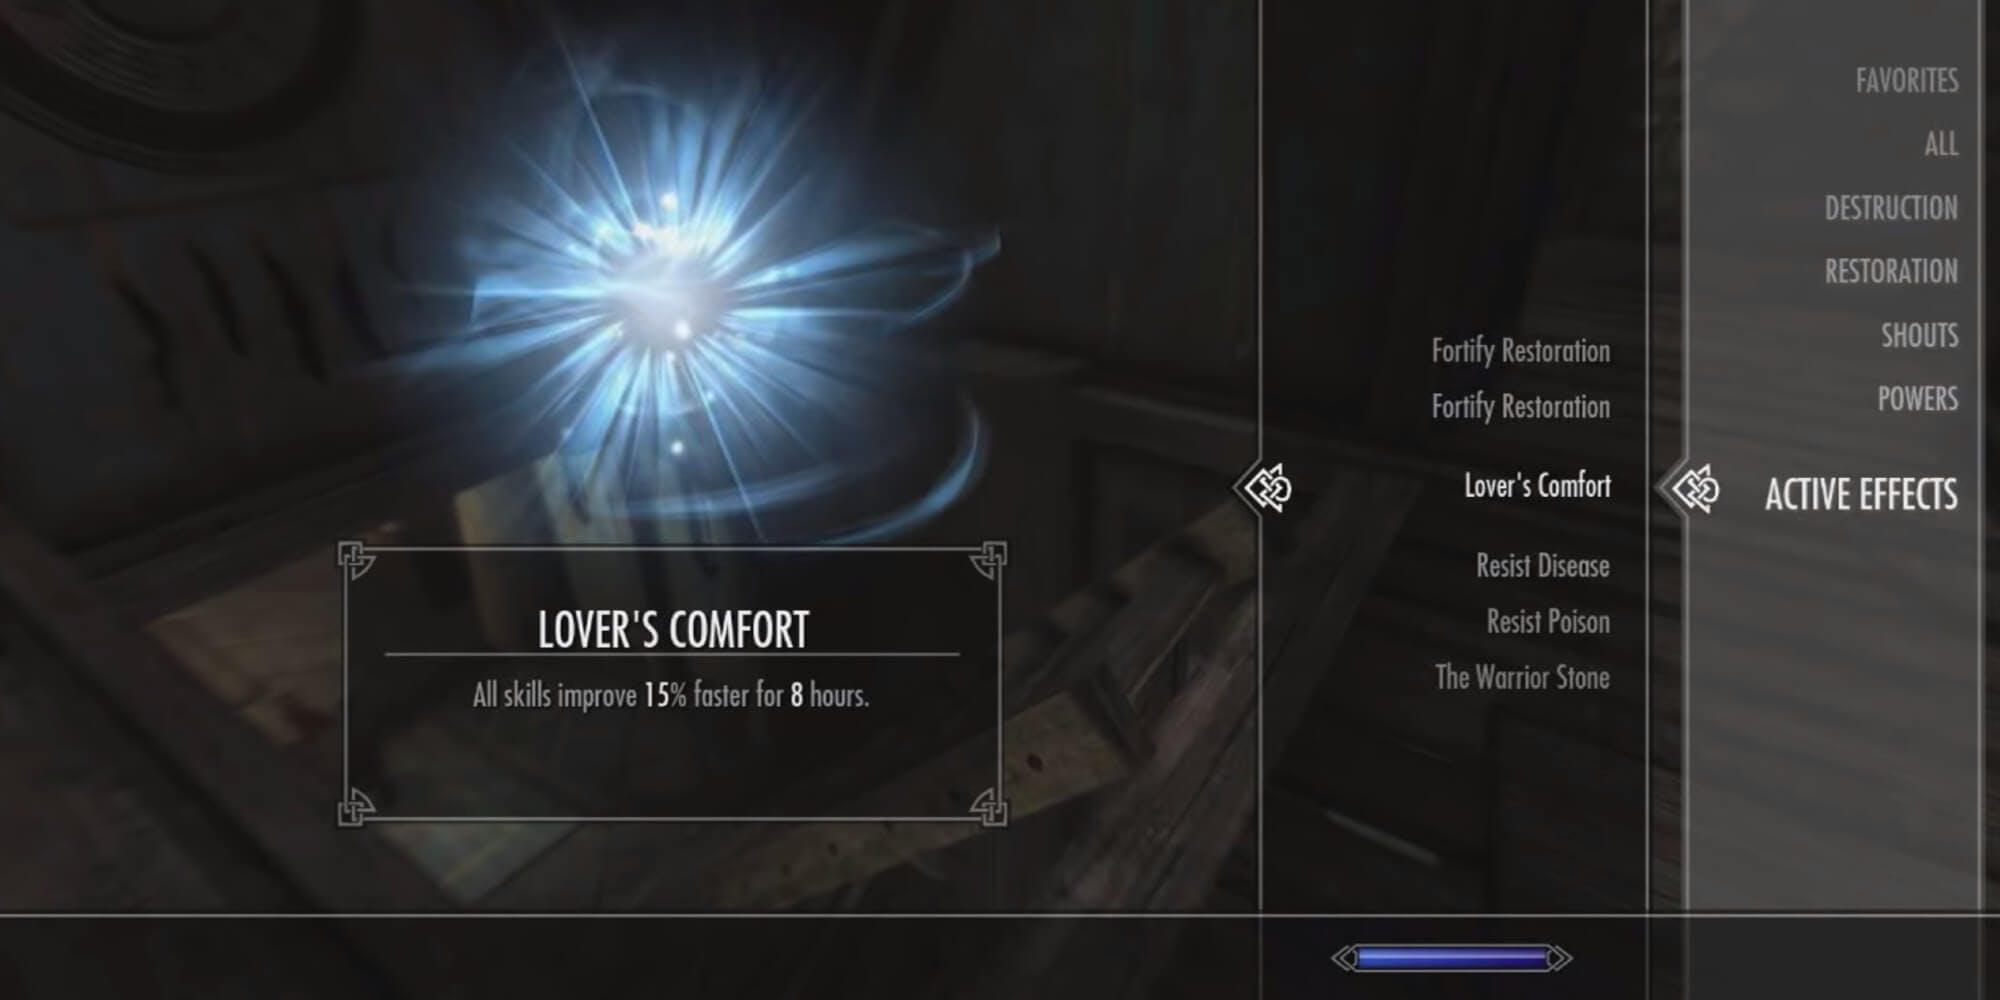 Skyrim - Lover's Comfort